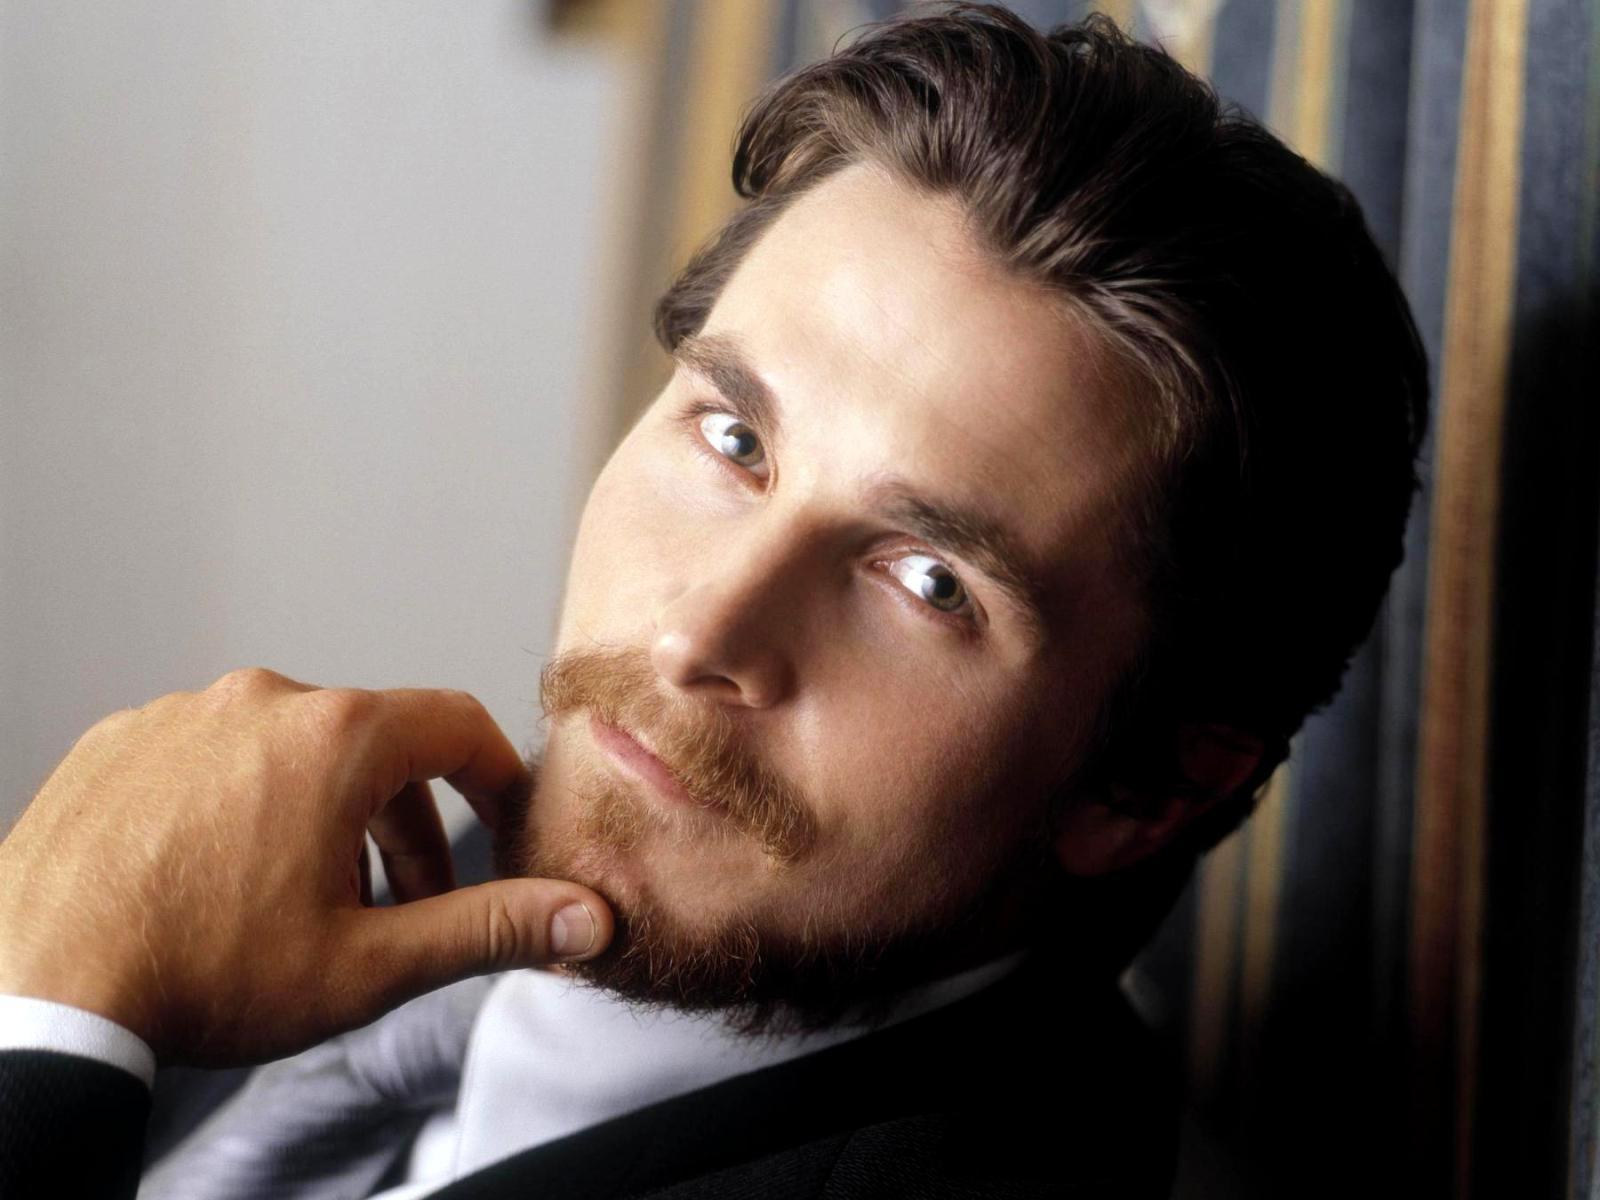 Episode 15: Christian Bale? No Thank You